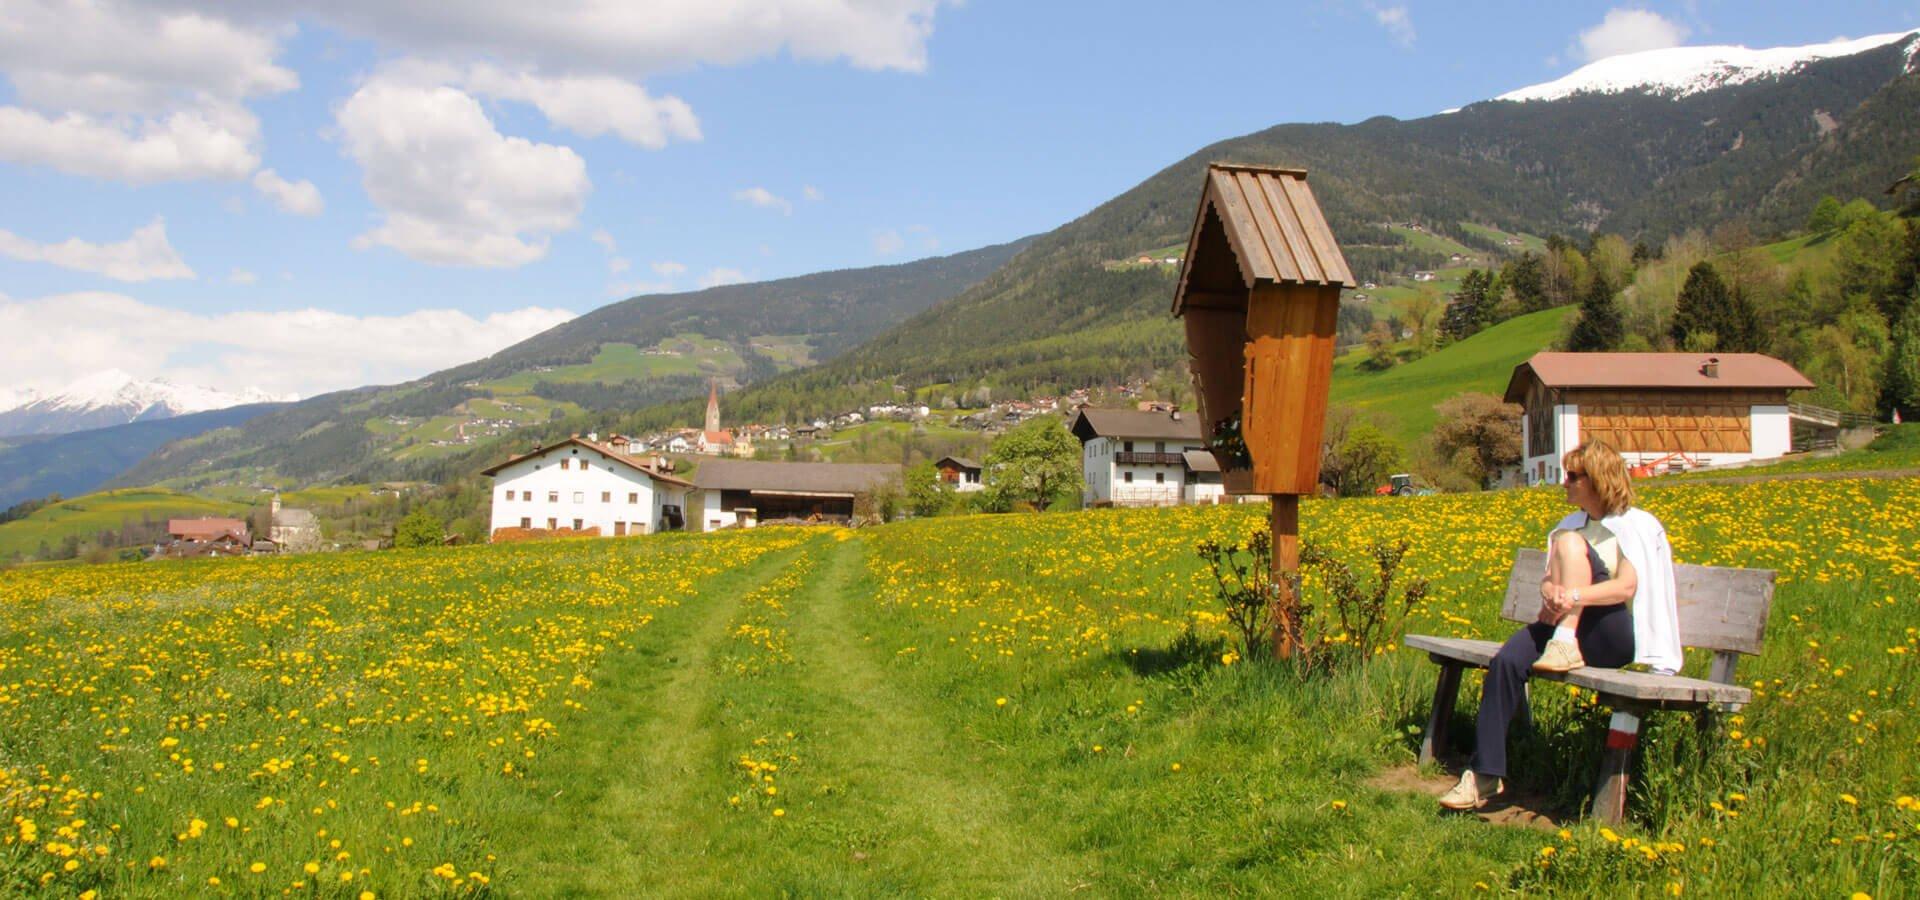 urlaubsglueck-schnagererhof-brixen